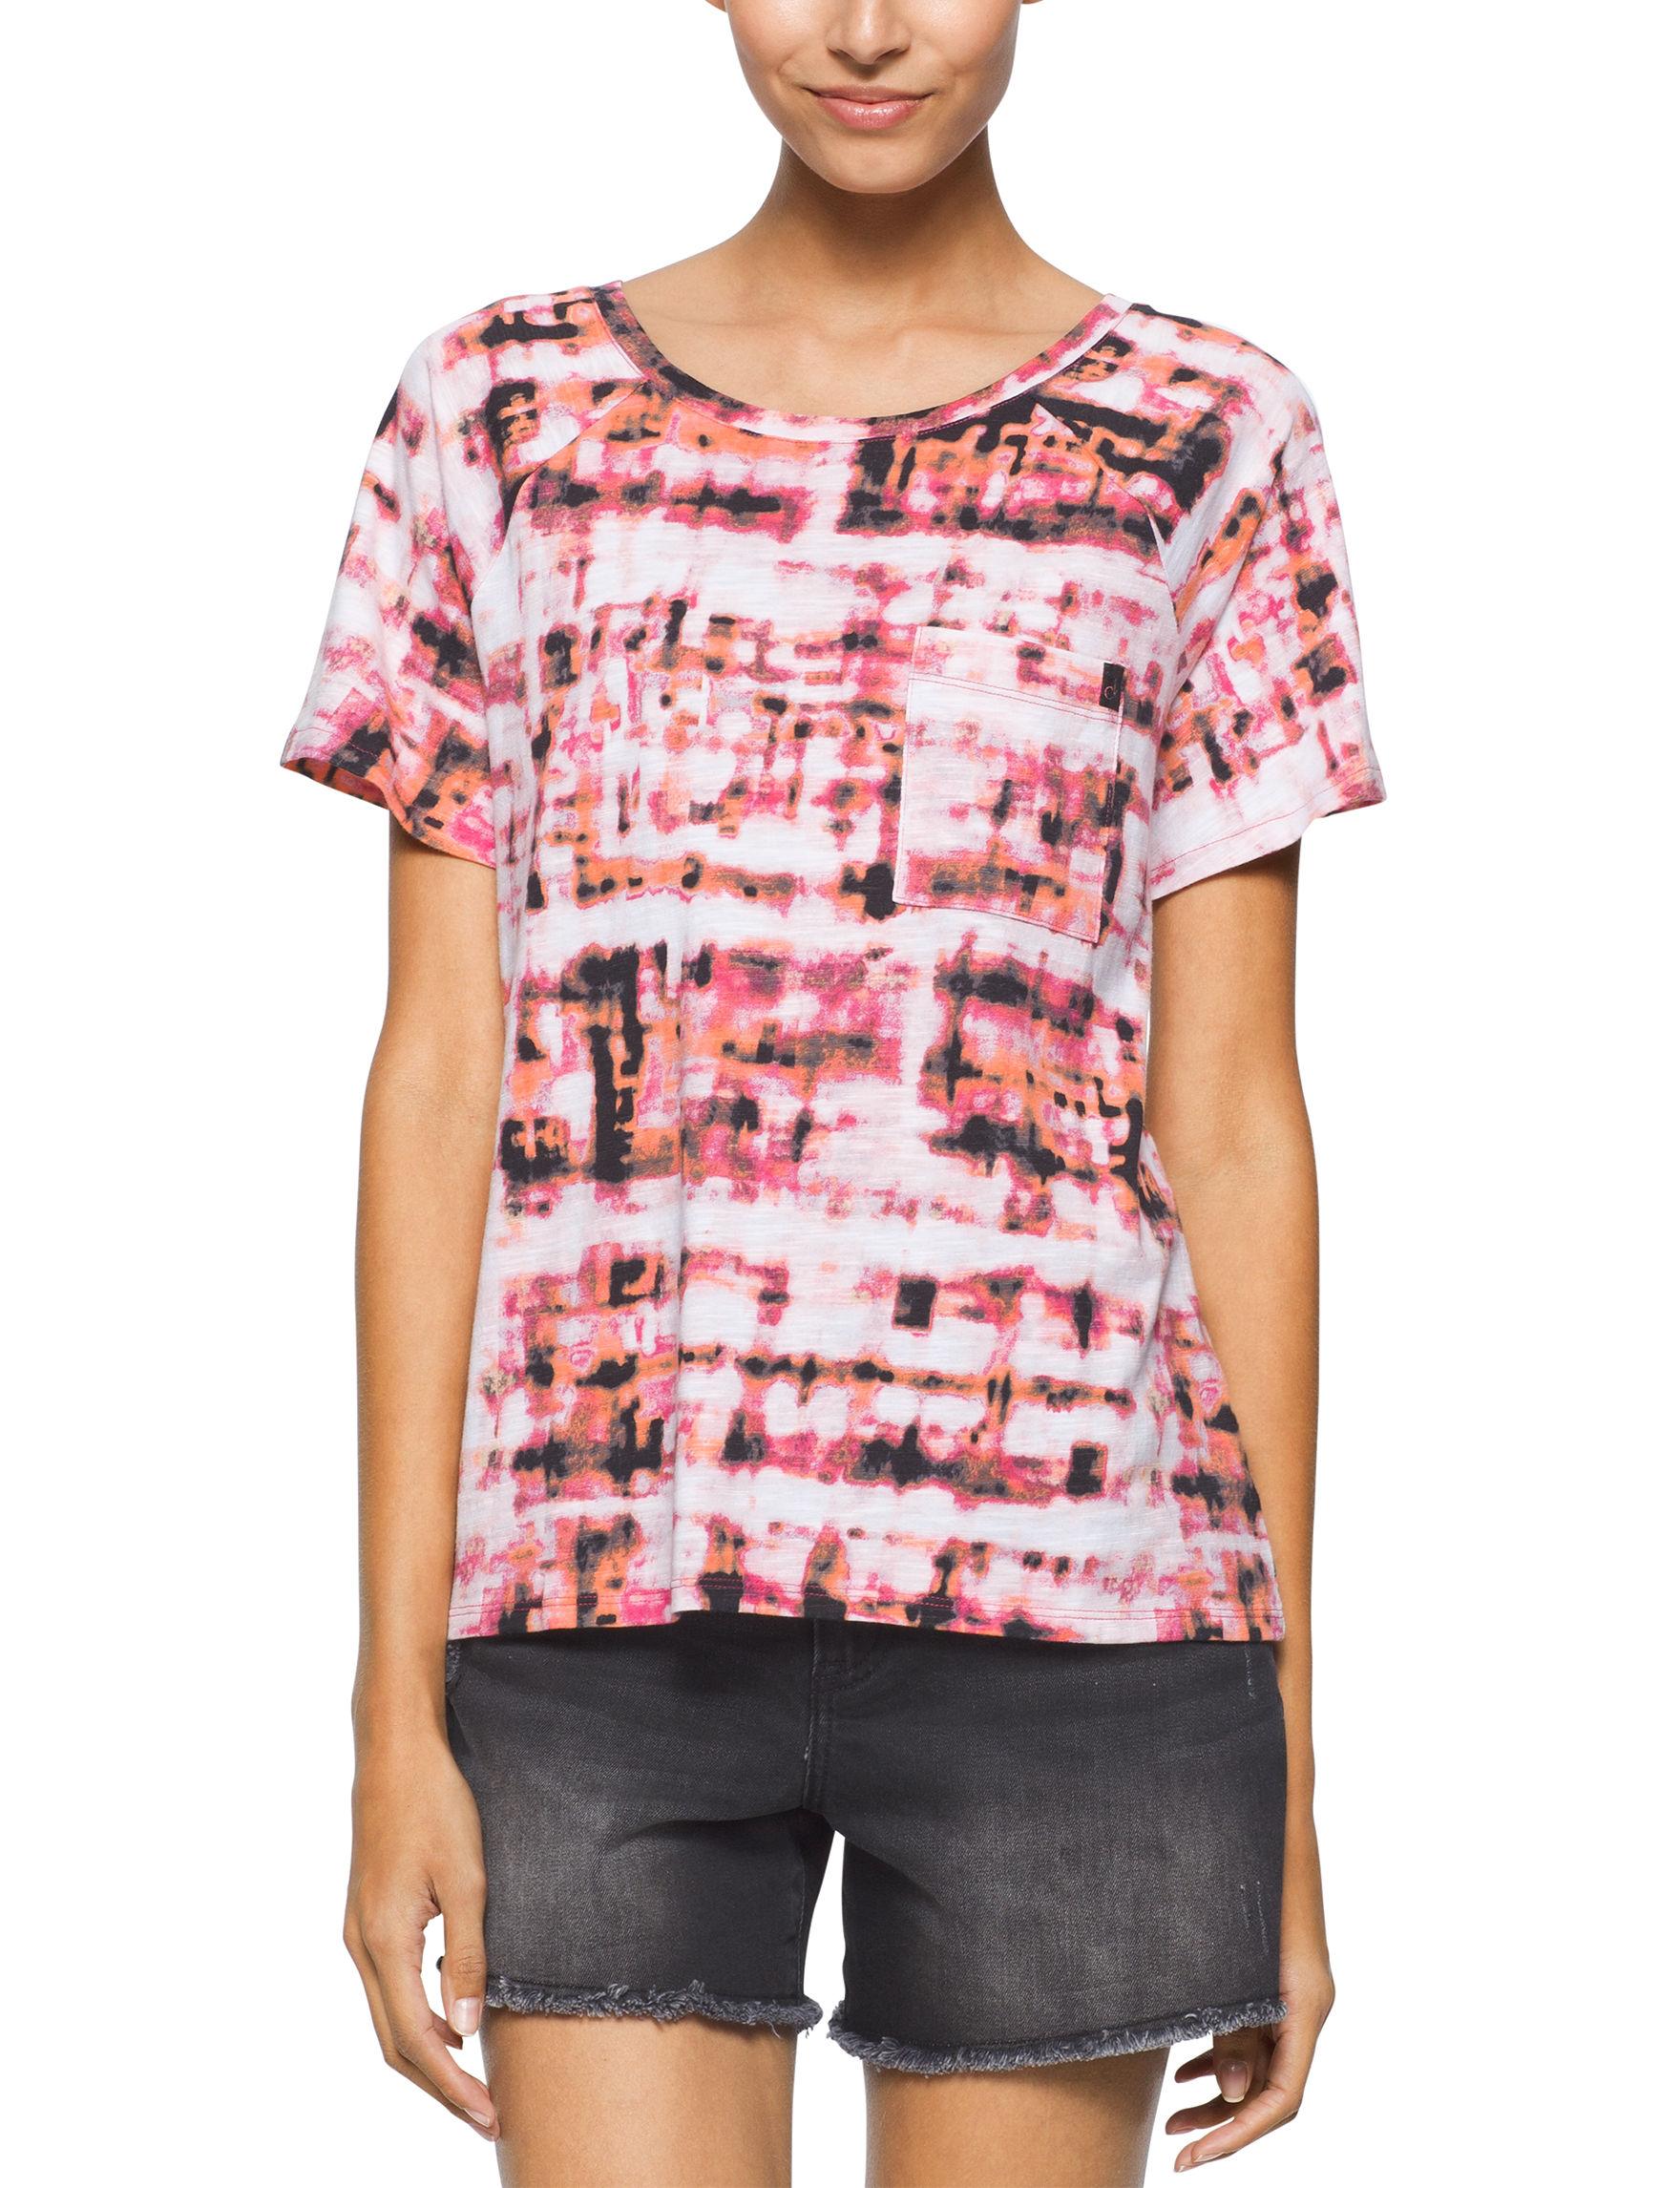 Calvin Klein Jeans Pink Multi Shirts & Blouses